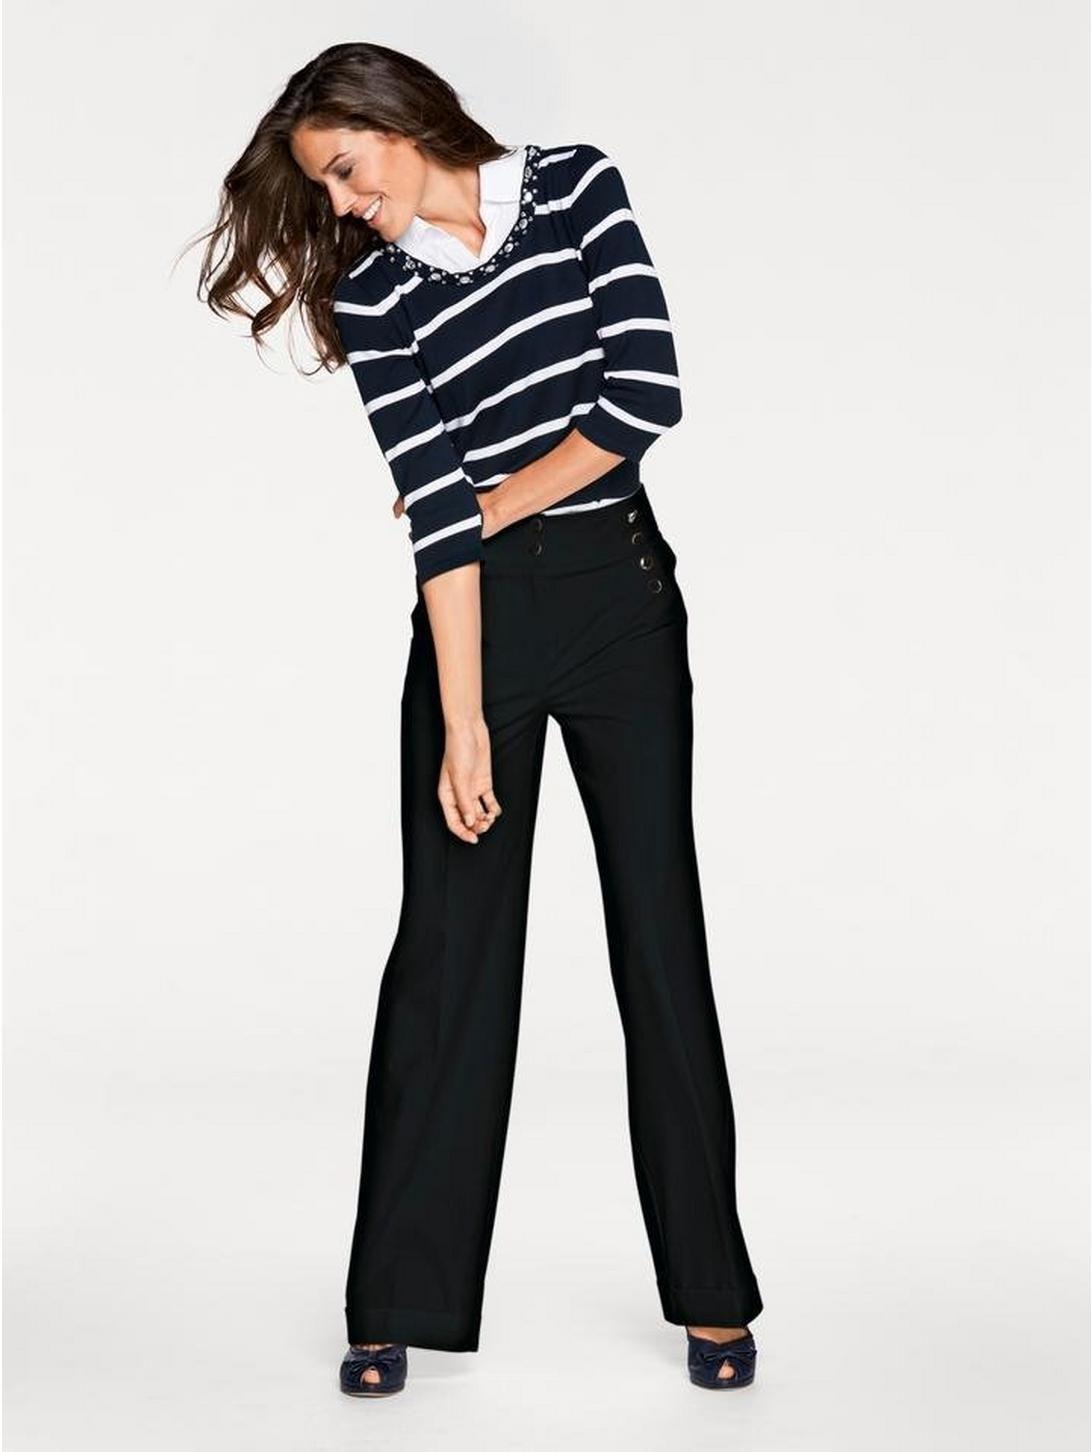 886c6e07368 Pantalon femme style tendance